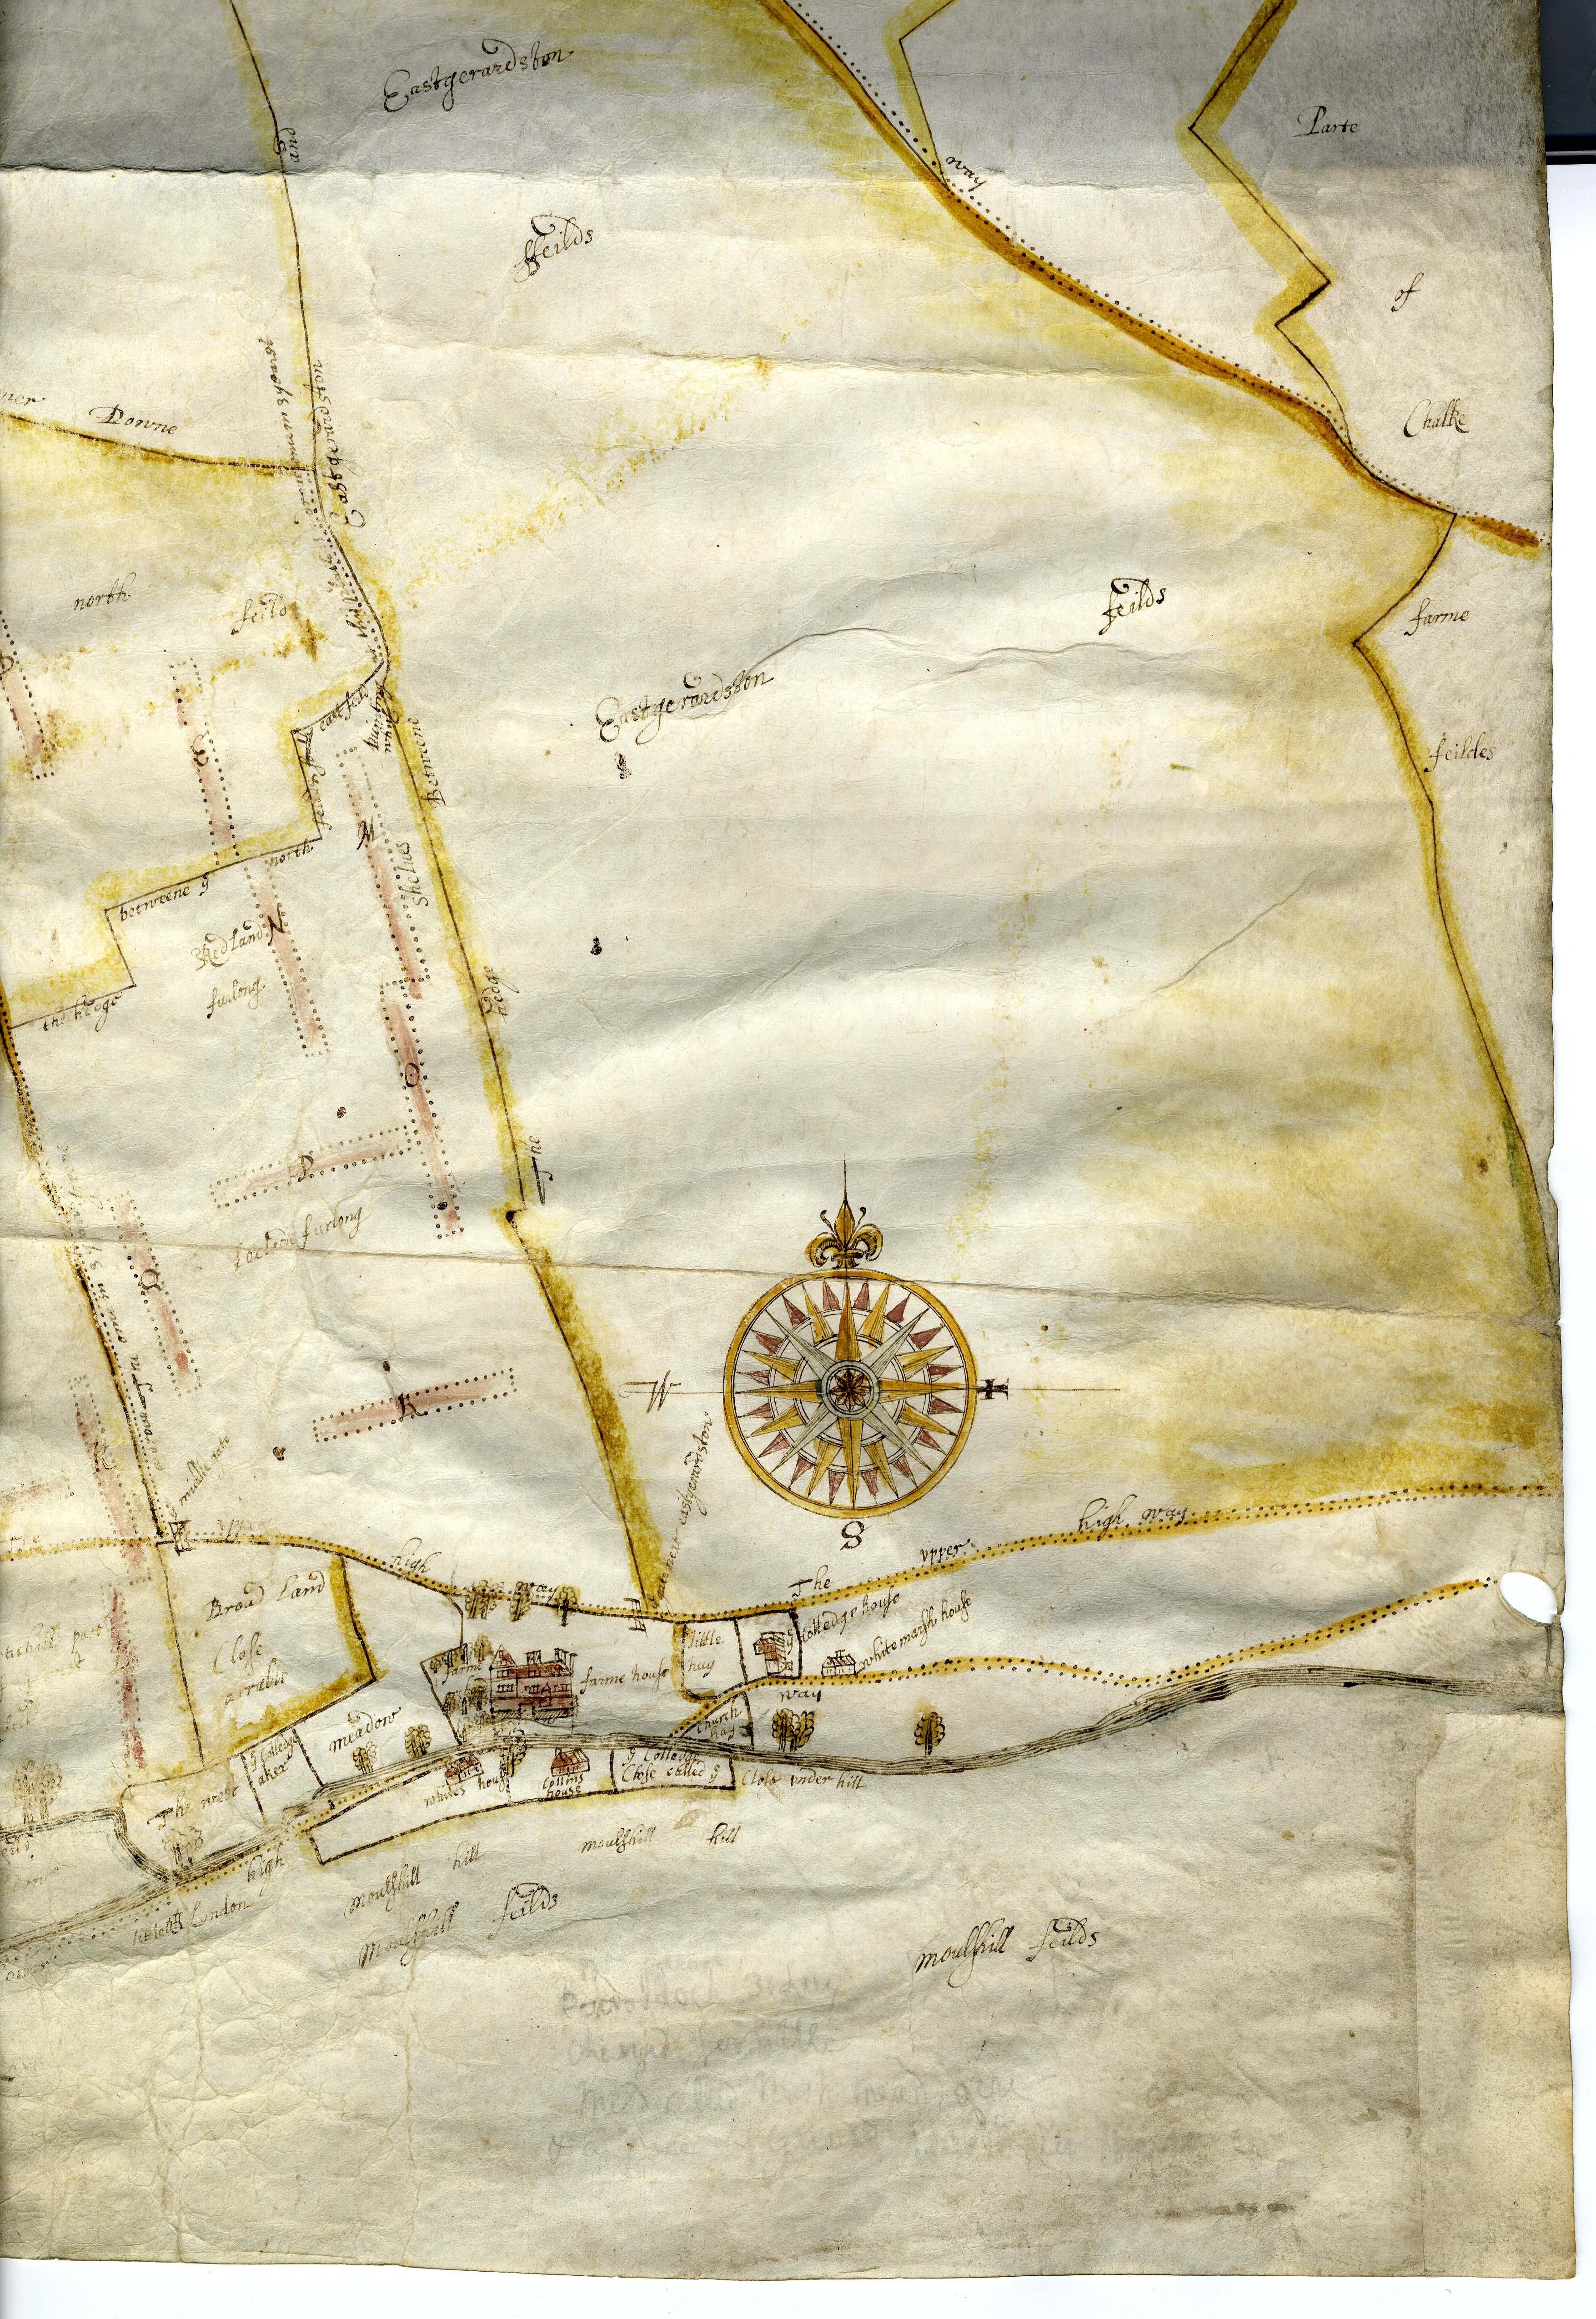 Map of Gerardstown image